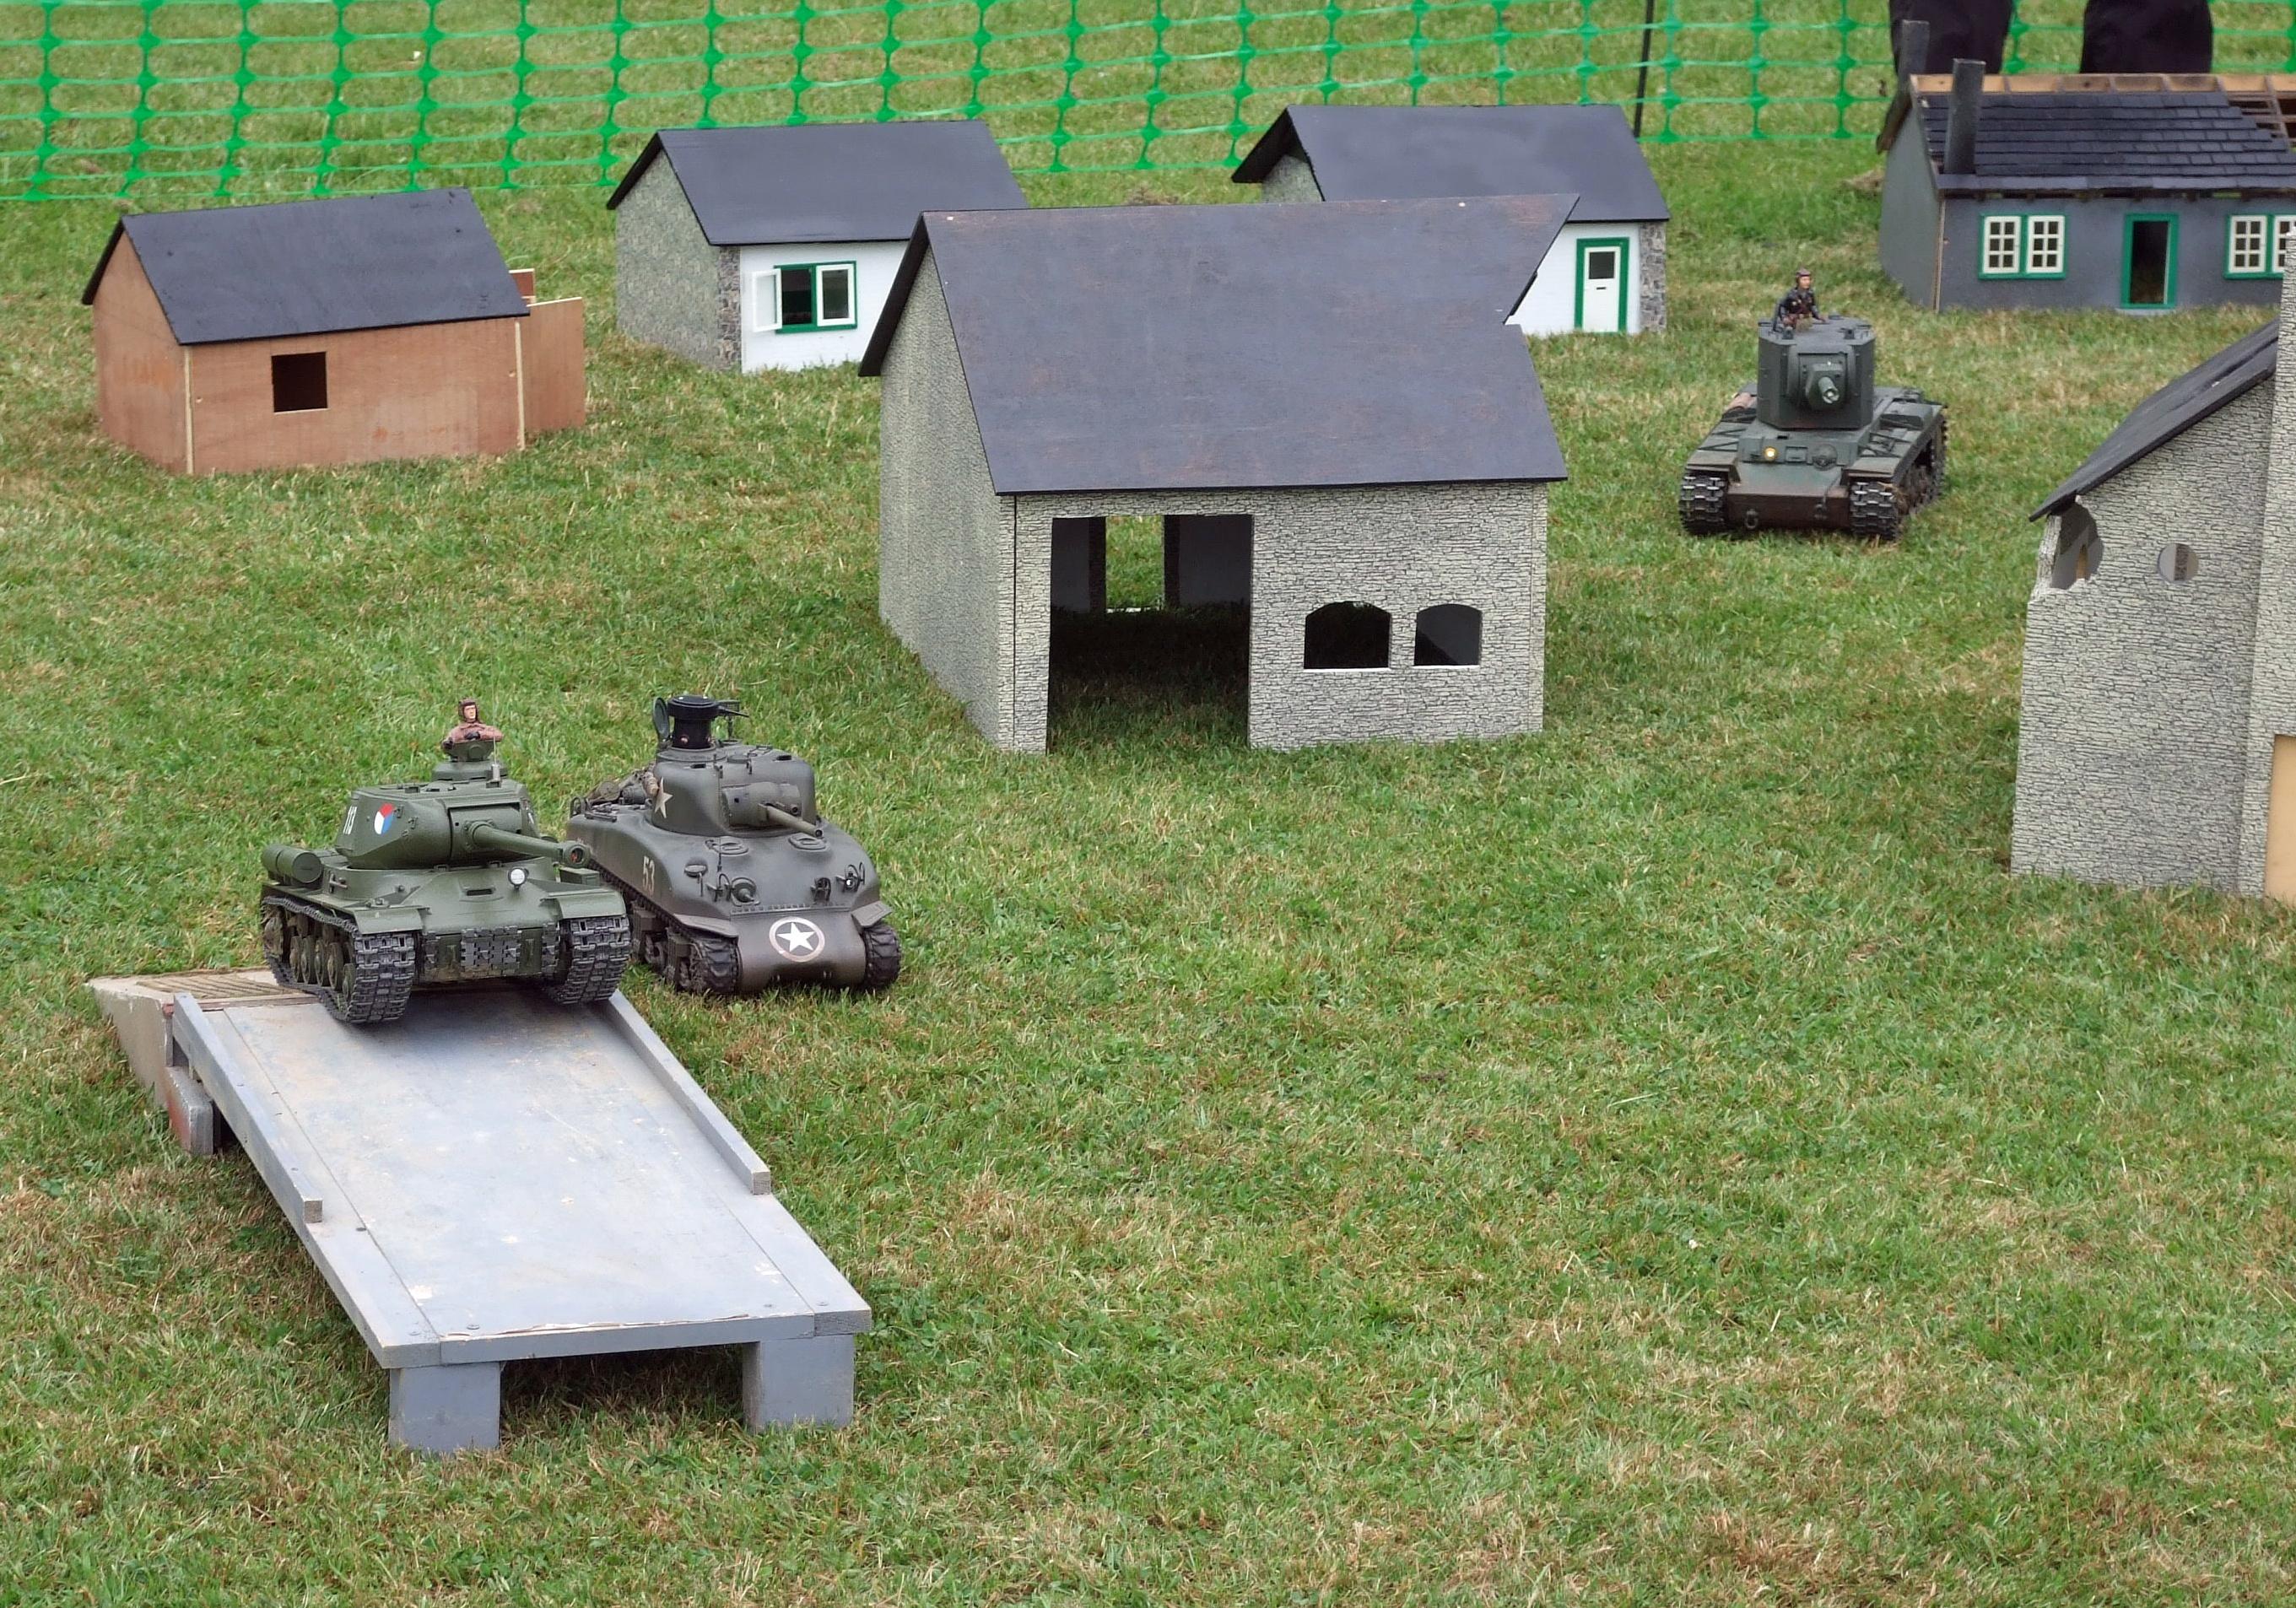 Model tanks were impressive